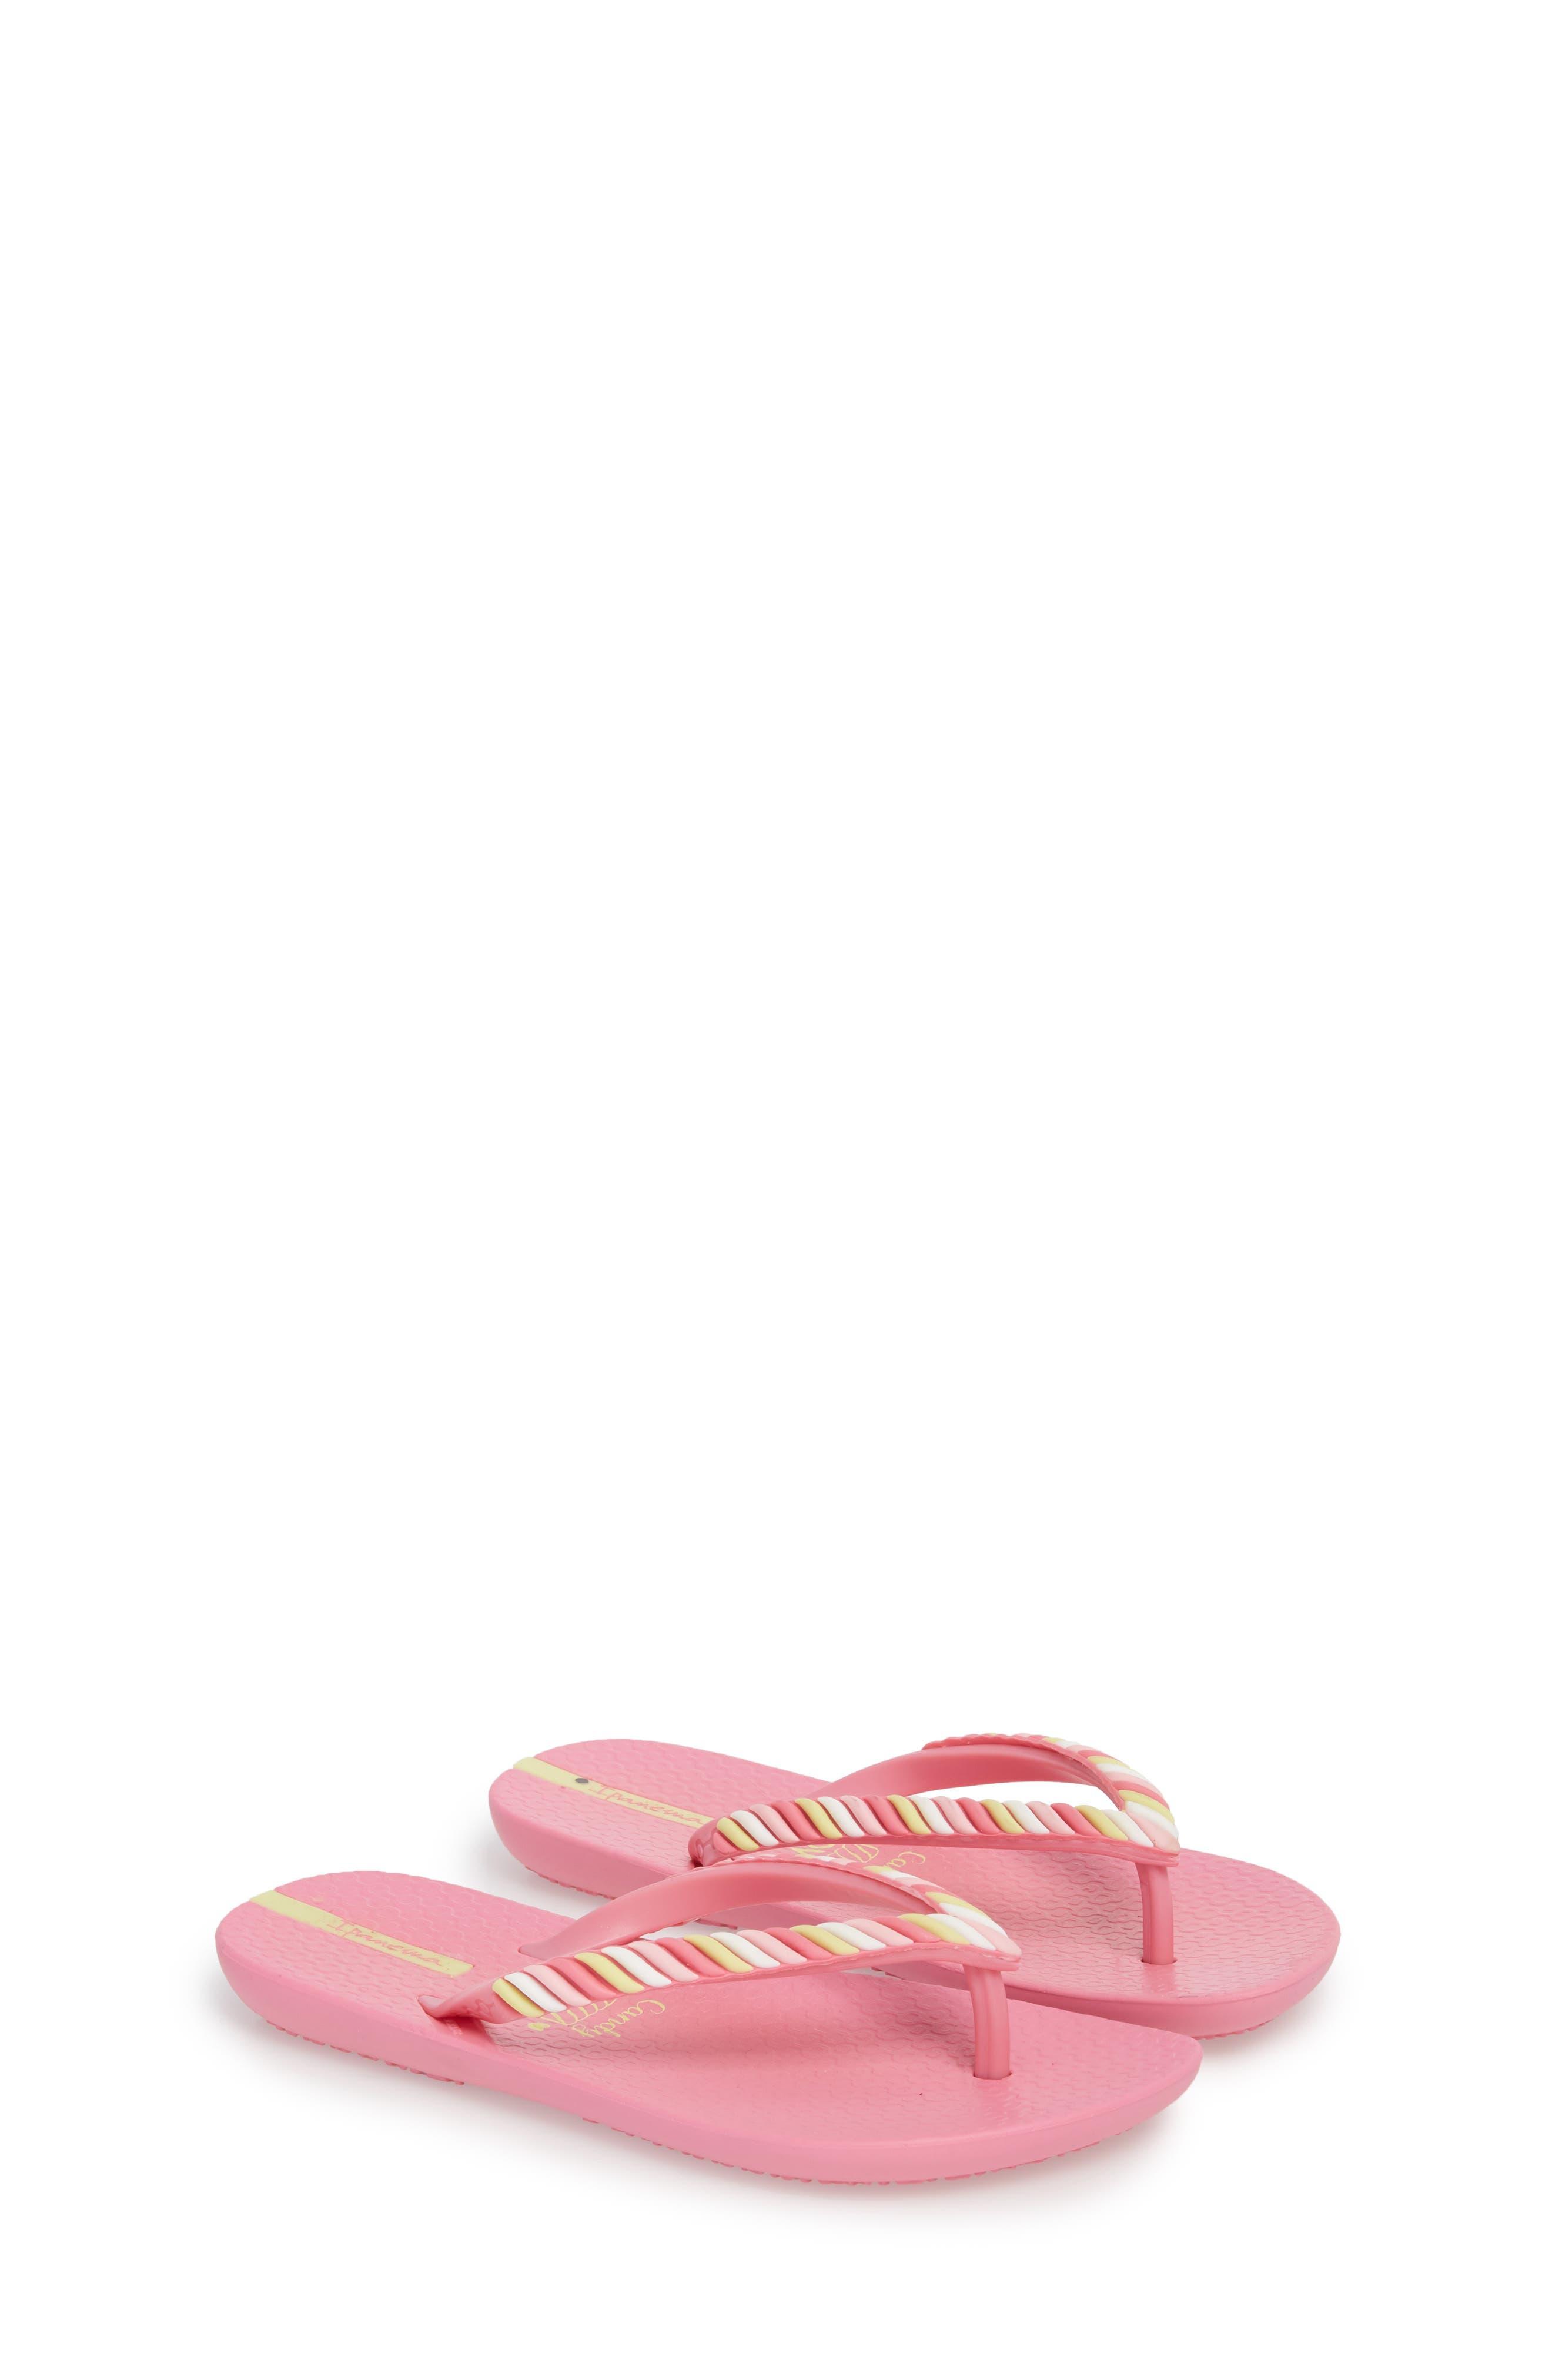 Alternate Image 3  - Ipanema Candy Kids Flip Flop (Toddler & Little Kid)